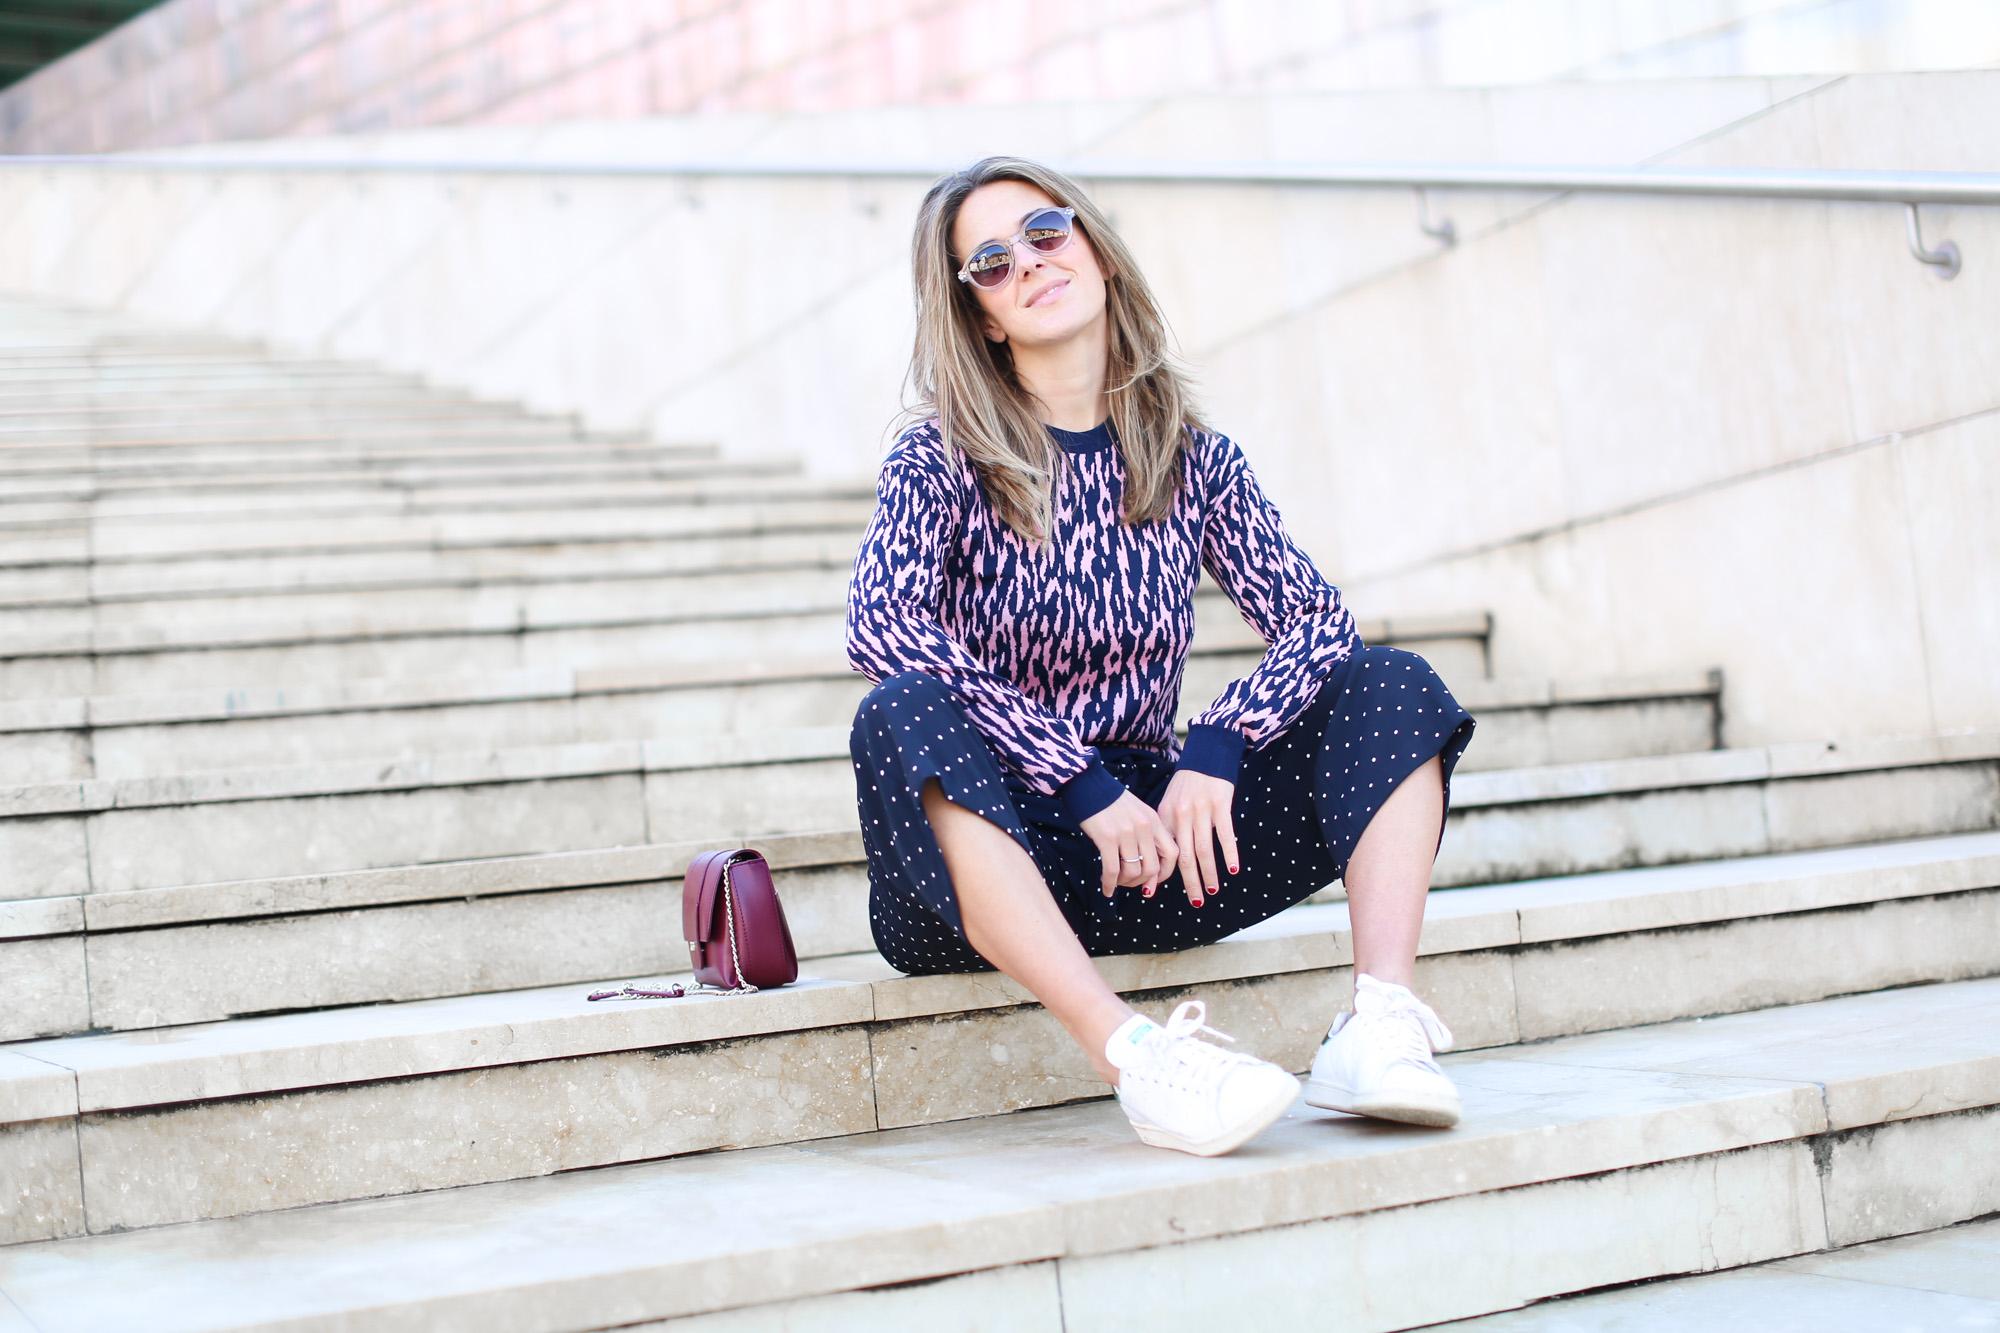 Clochet_streetstyle_fashionblogger_andotherstories_merinowooljacquardsweater_leopardprintpinkandblue_adidasstansmith-8